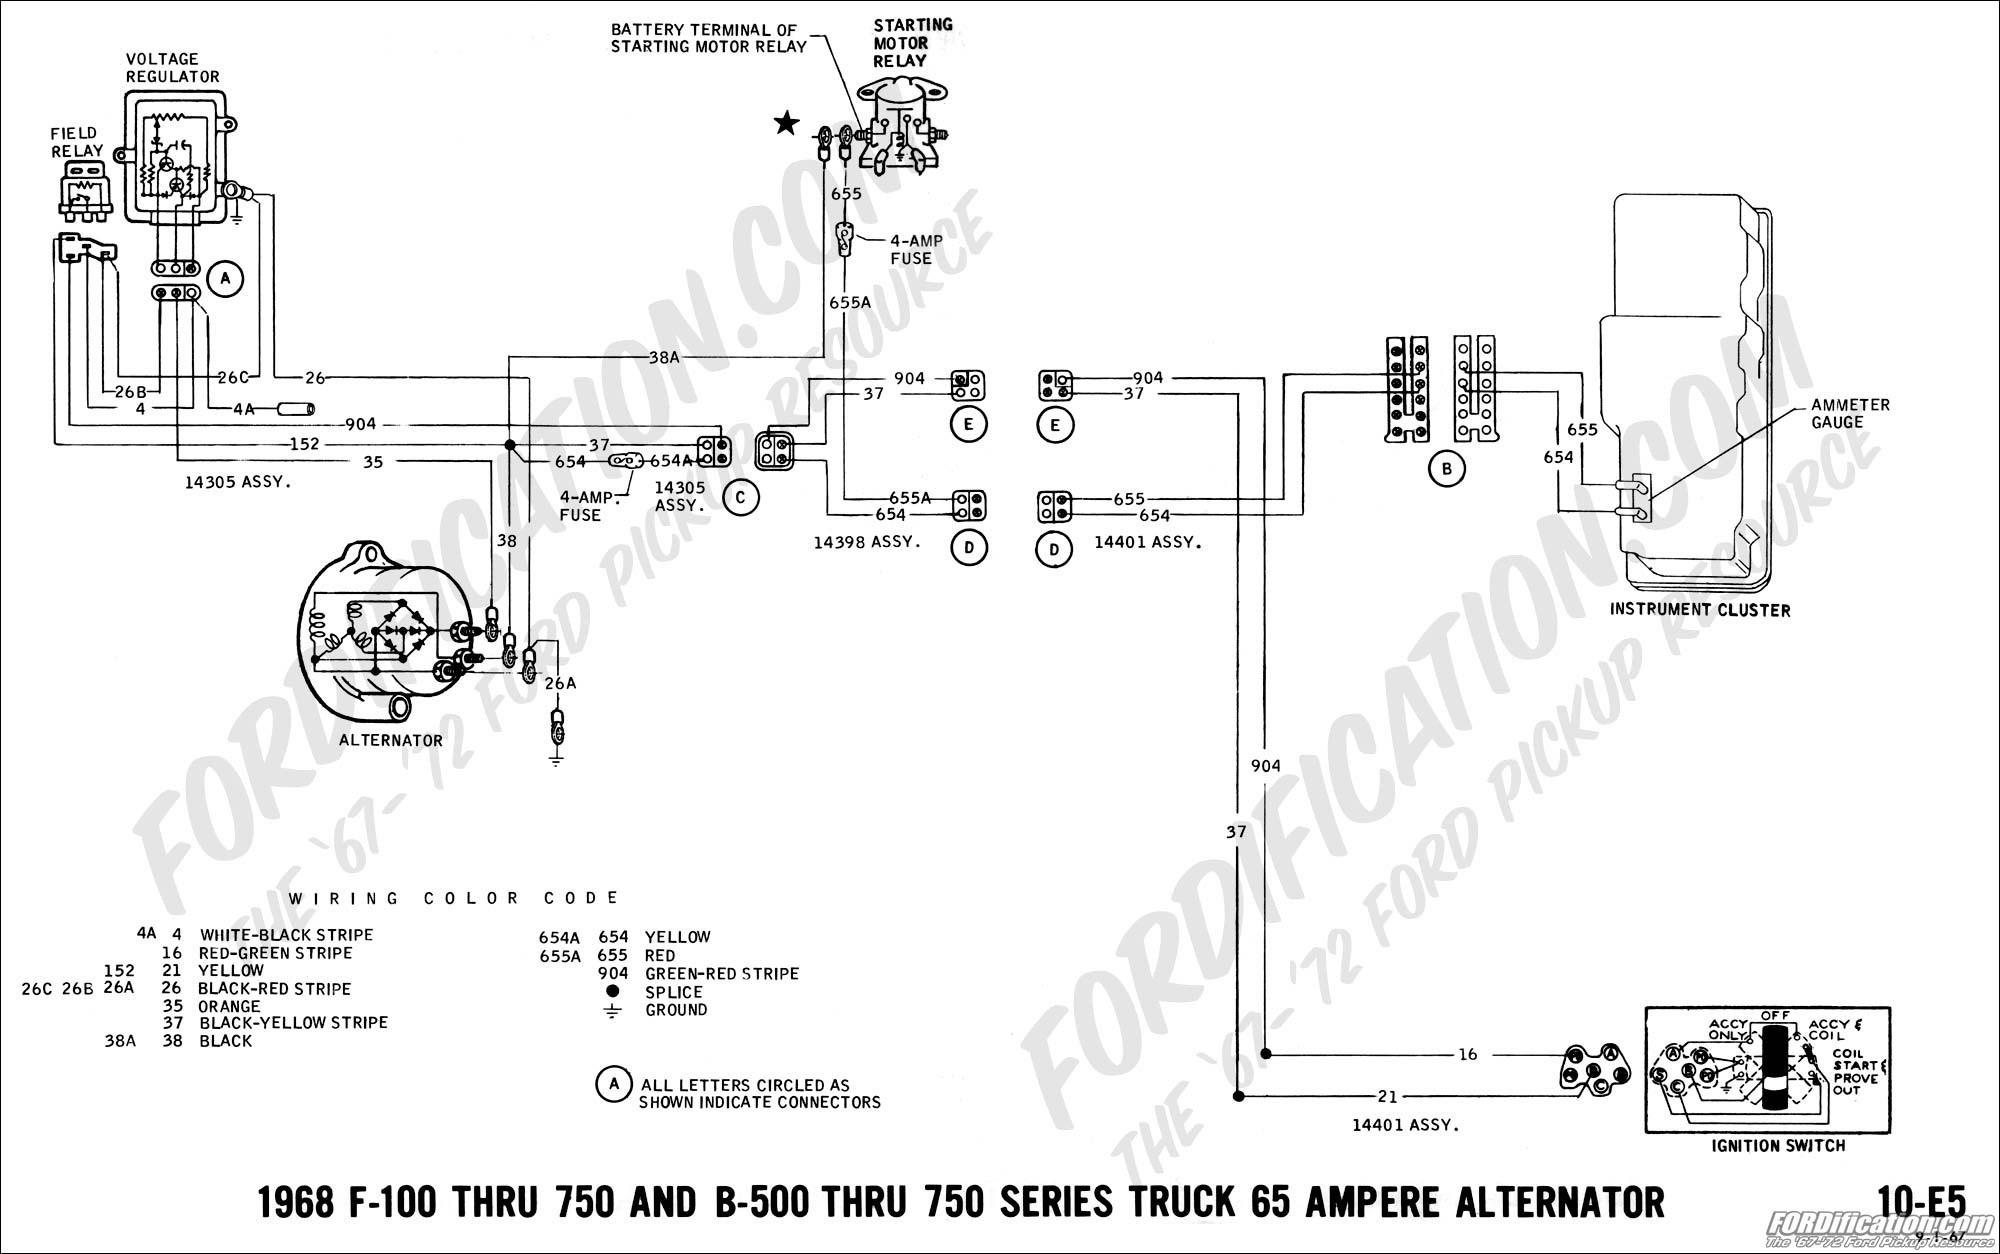 Harley Davidson Voltage Regulator Wiring Diagram   Manual E-Books - Harley Davidson Voltage Regulator Wiring Diagram